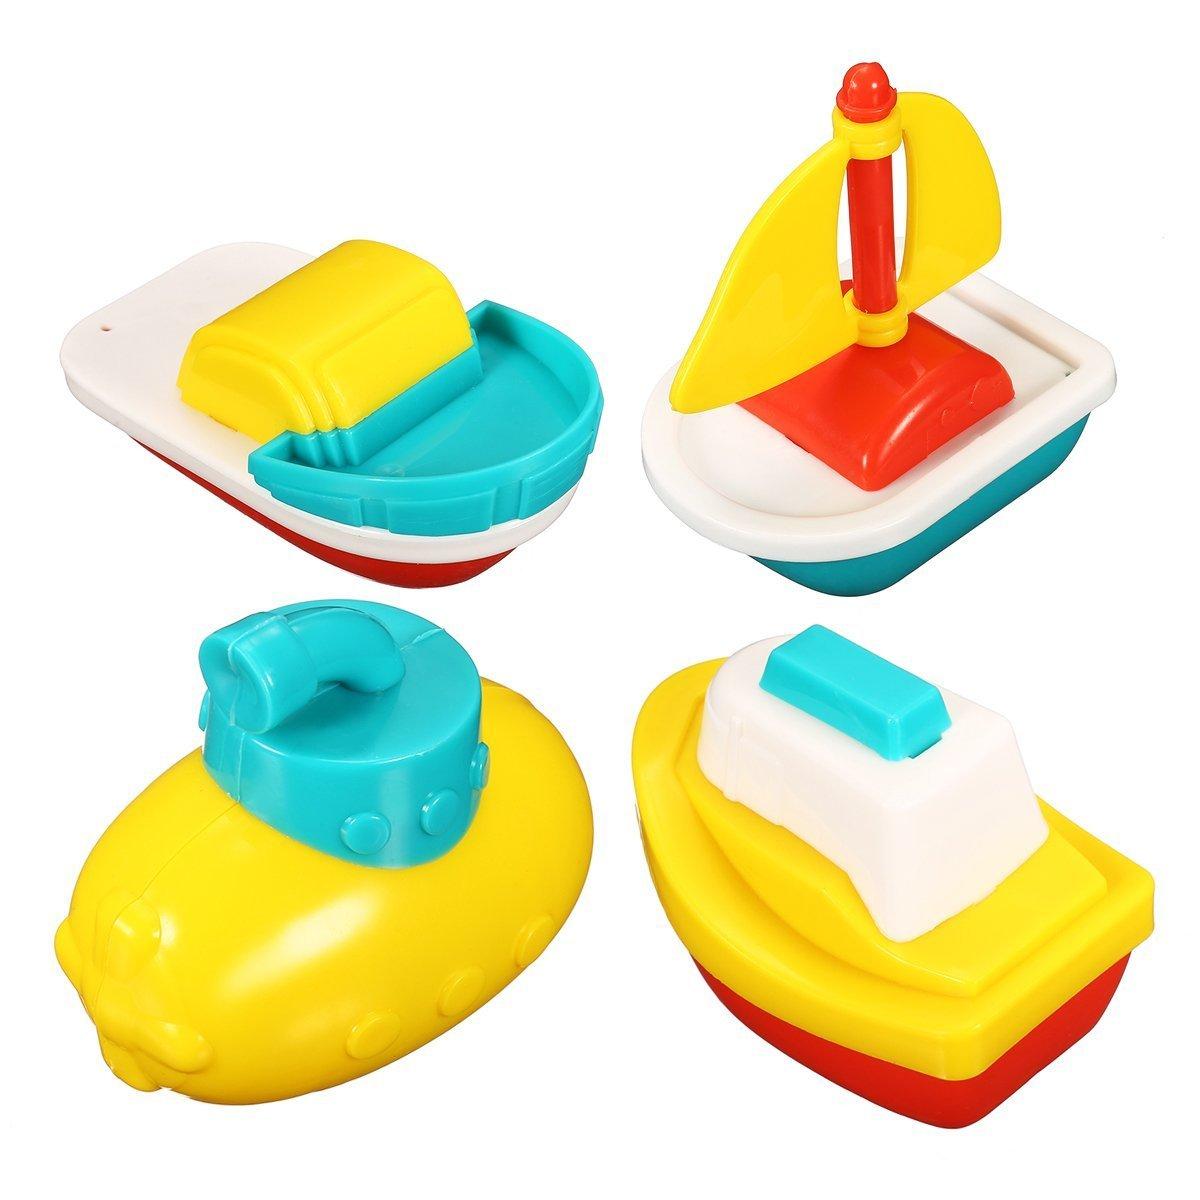 Pack de 2 N/ûby 6199 Barcos flotantes Surtido